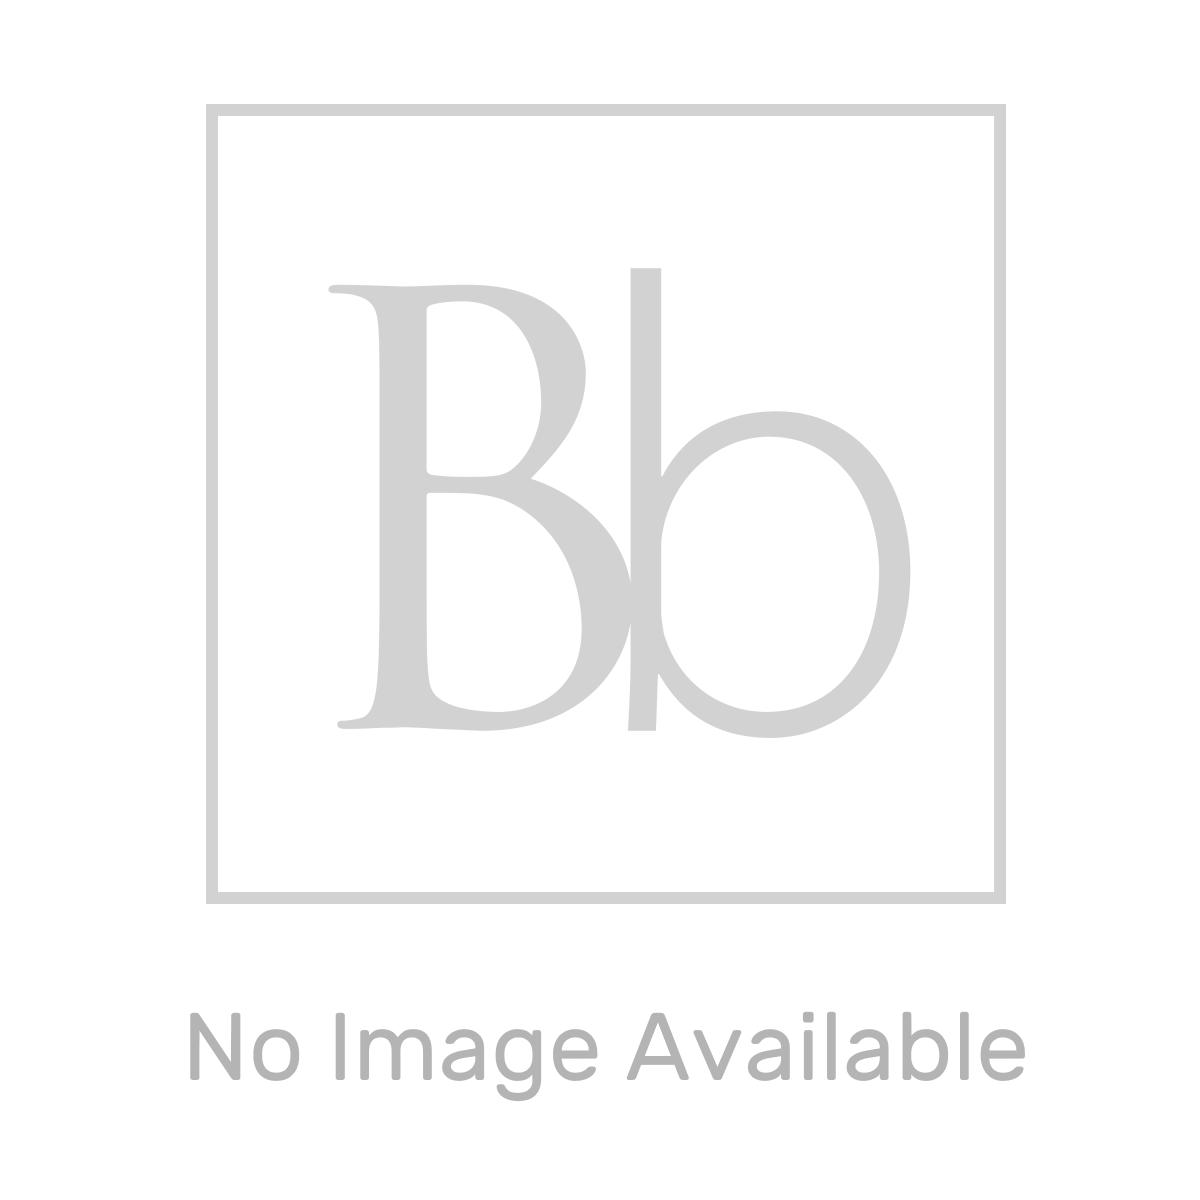 Ikoma White Gloss 4 Drawer Unit Soft Close Drawer